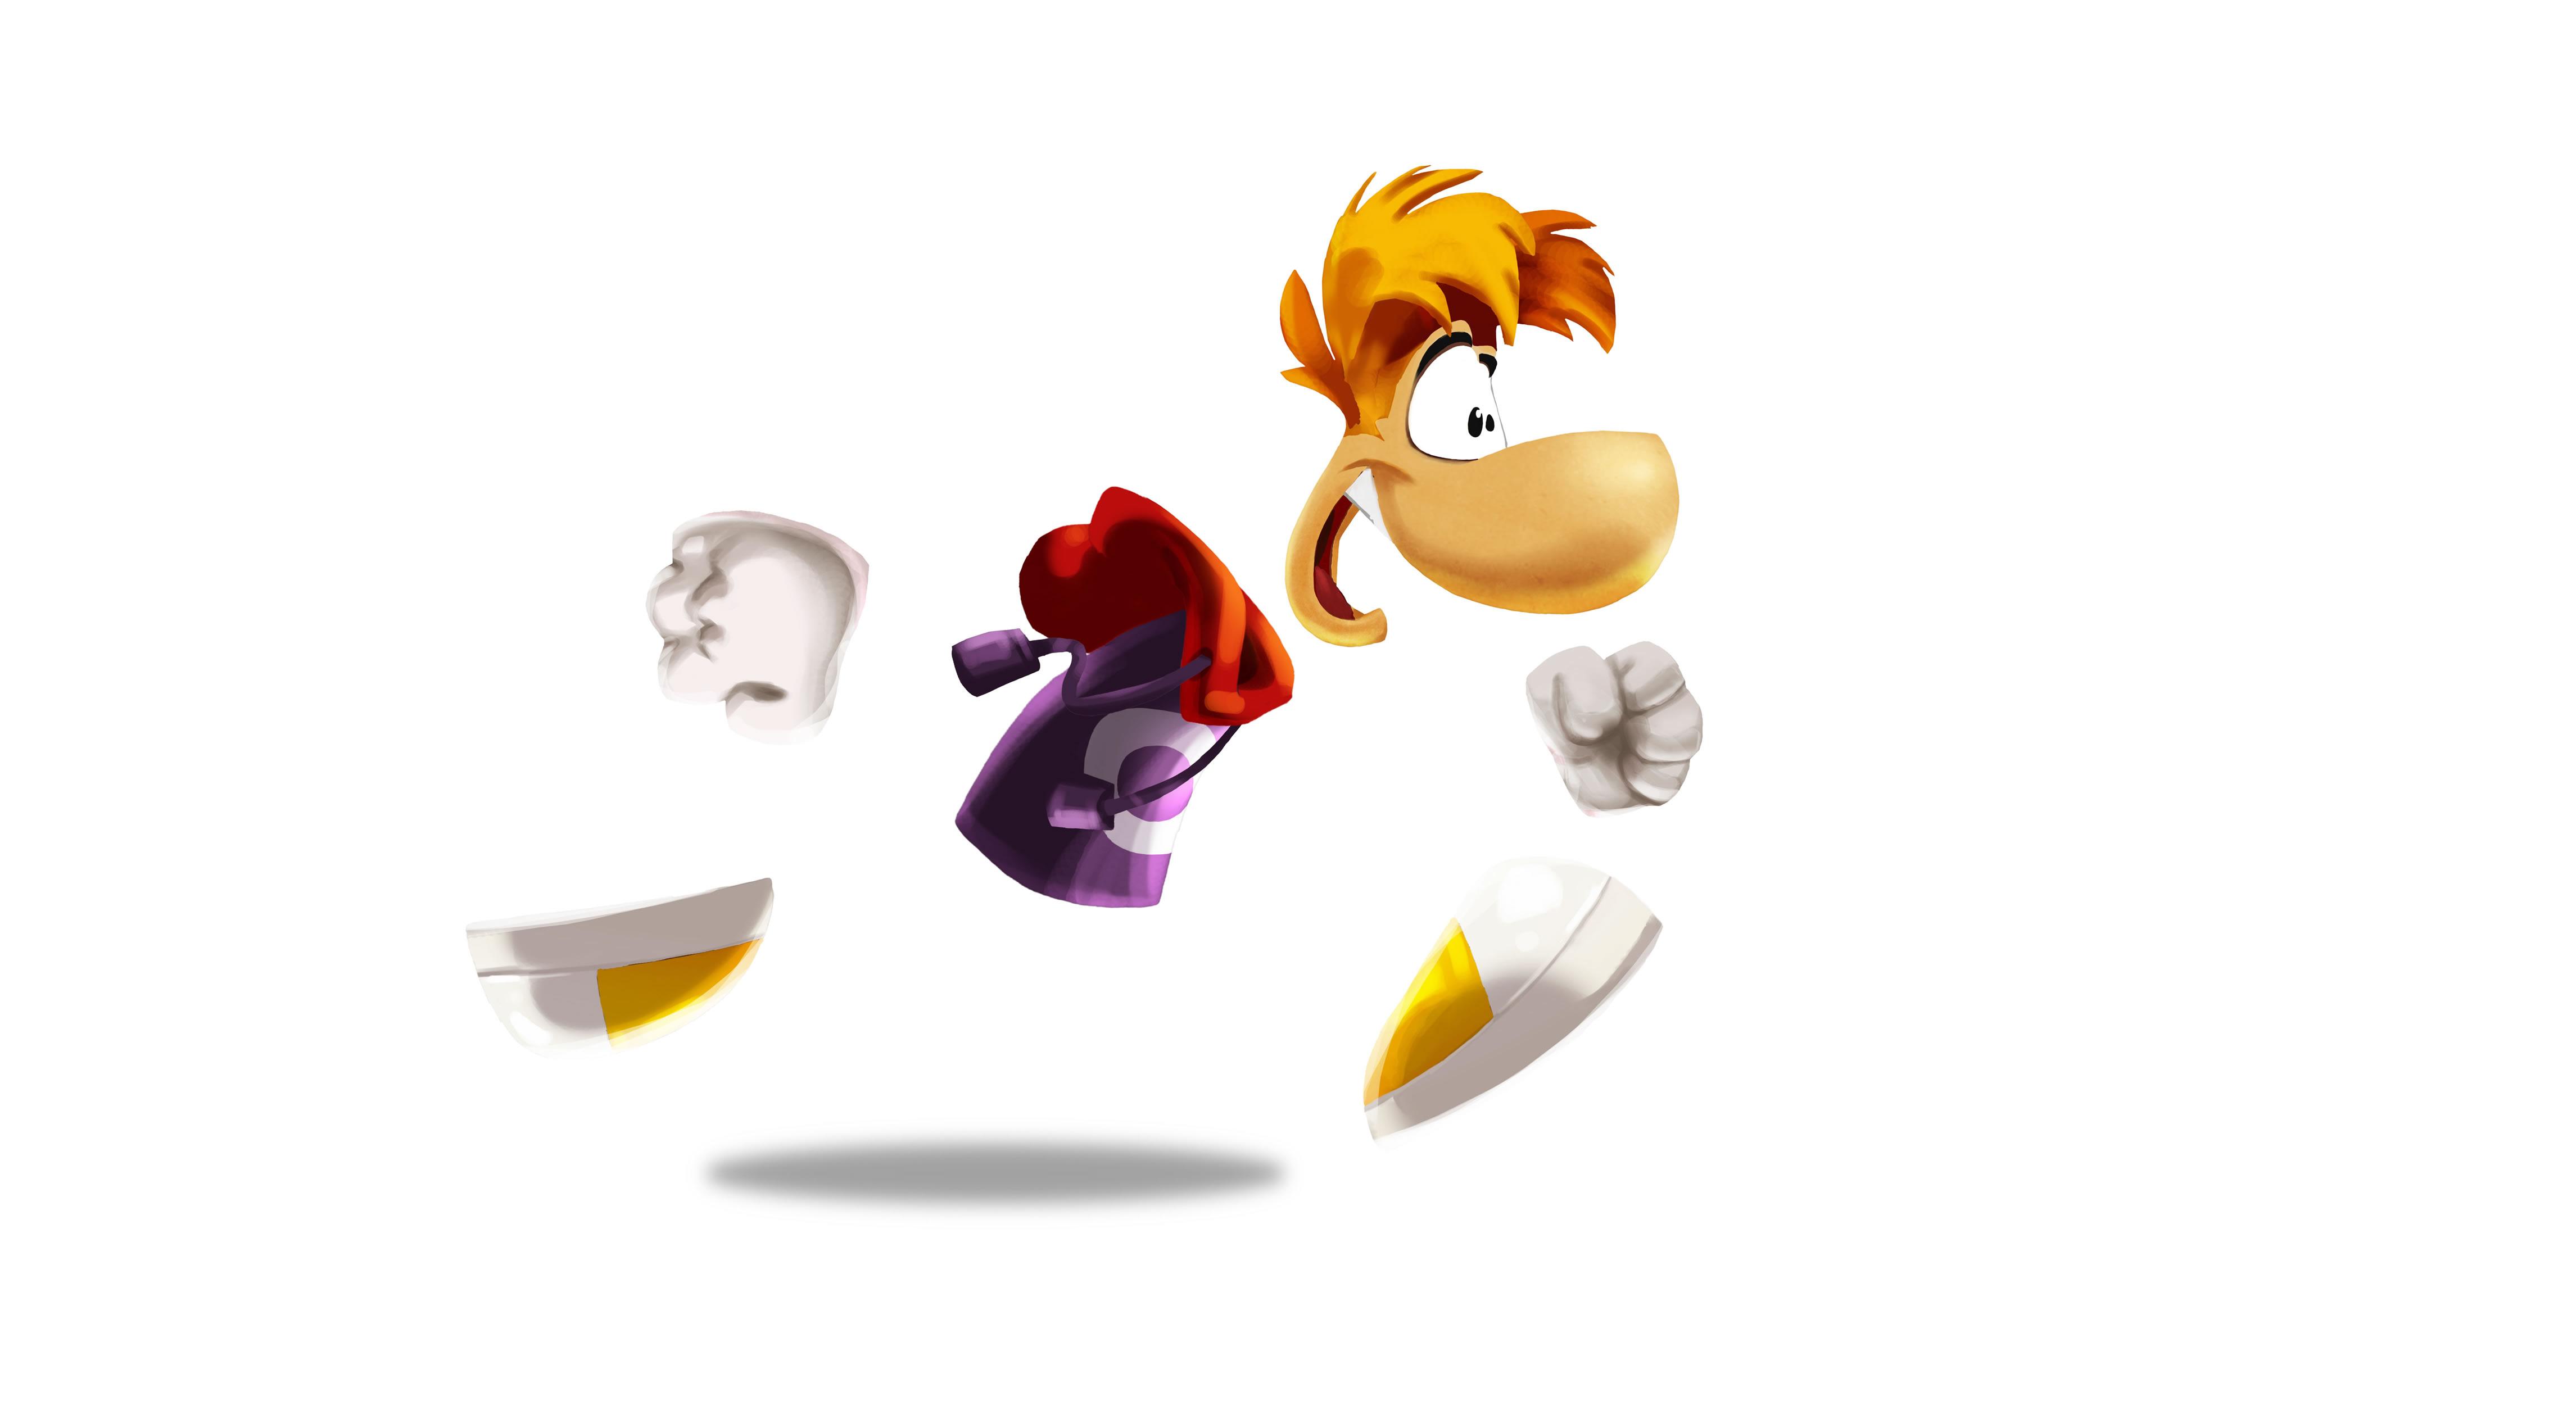 animated running man